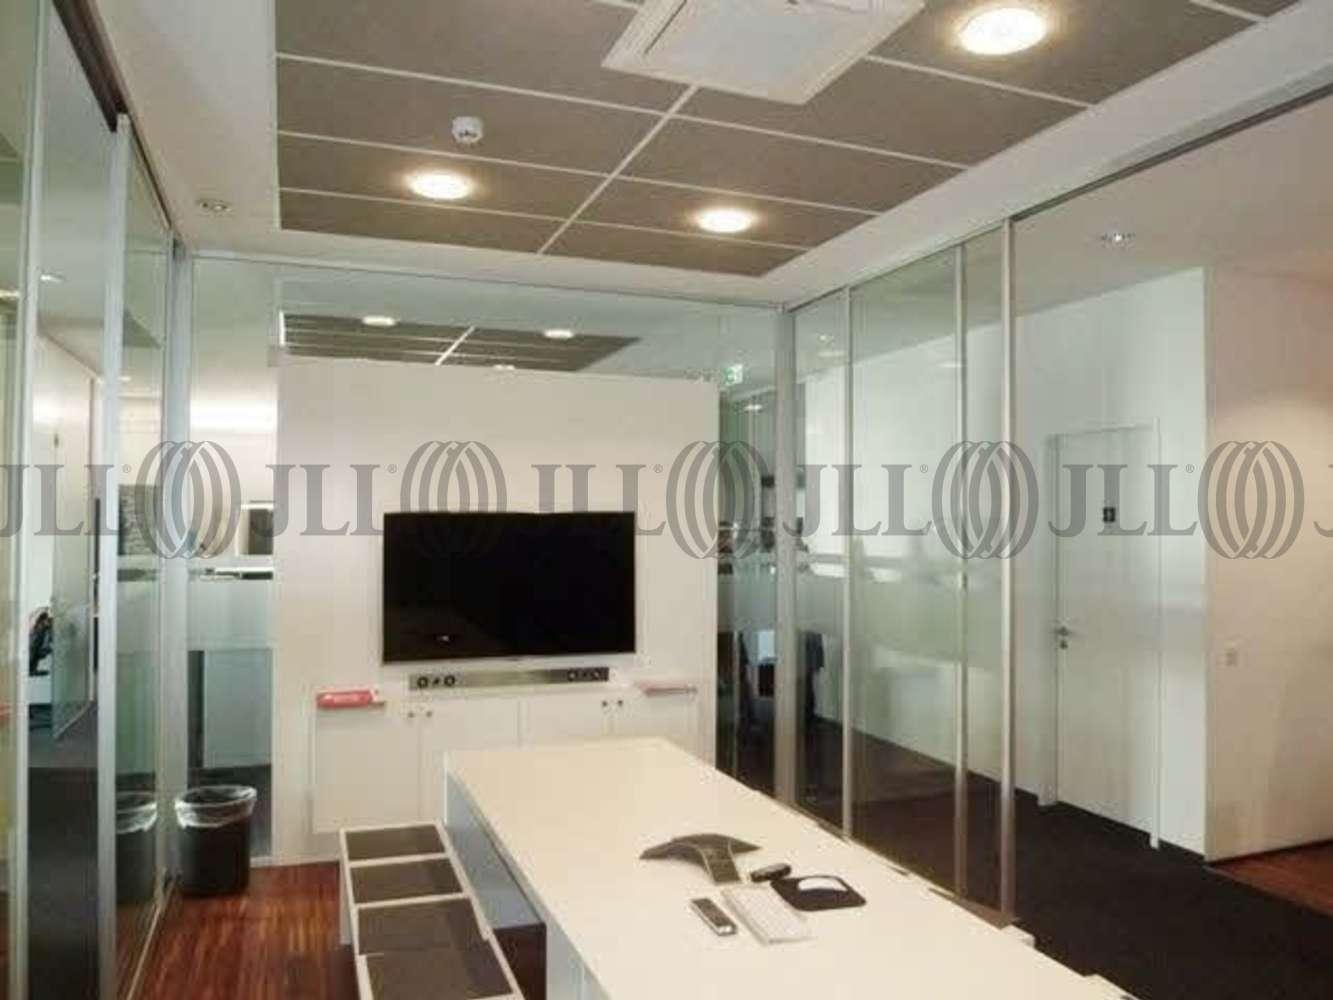 Büros Frankfurt am main, 60314 - Büro - Frankfurt am Main, Ostend - F1313 - 10912632